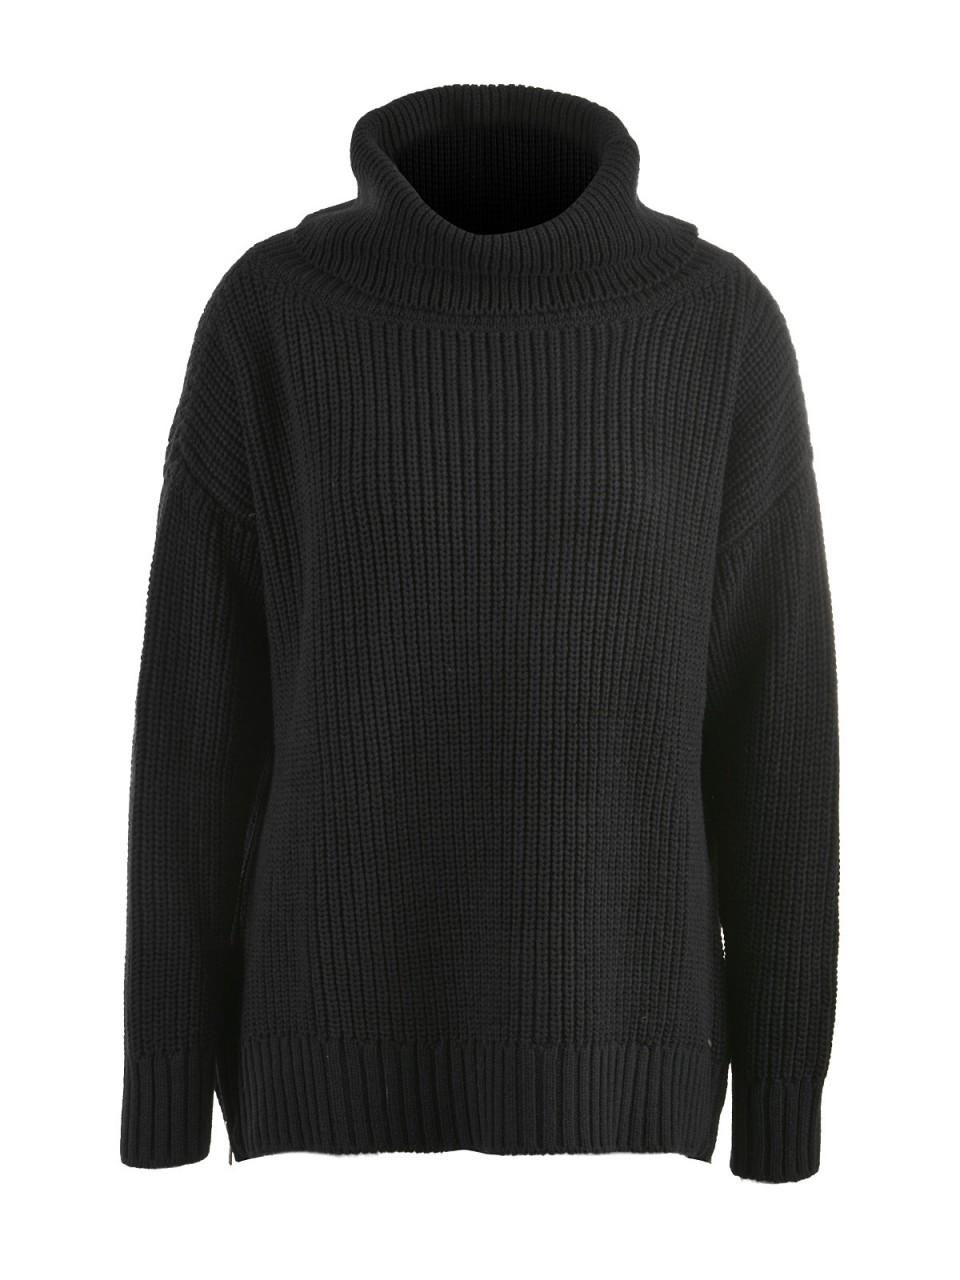 smith-amp-soul-damen-turtleneck-pullover-schwarz